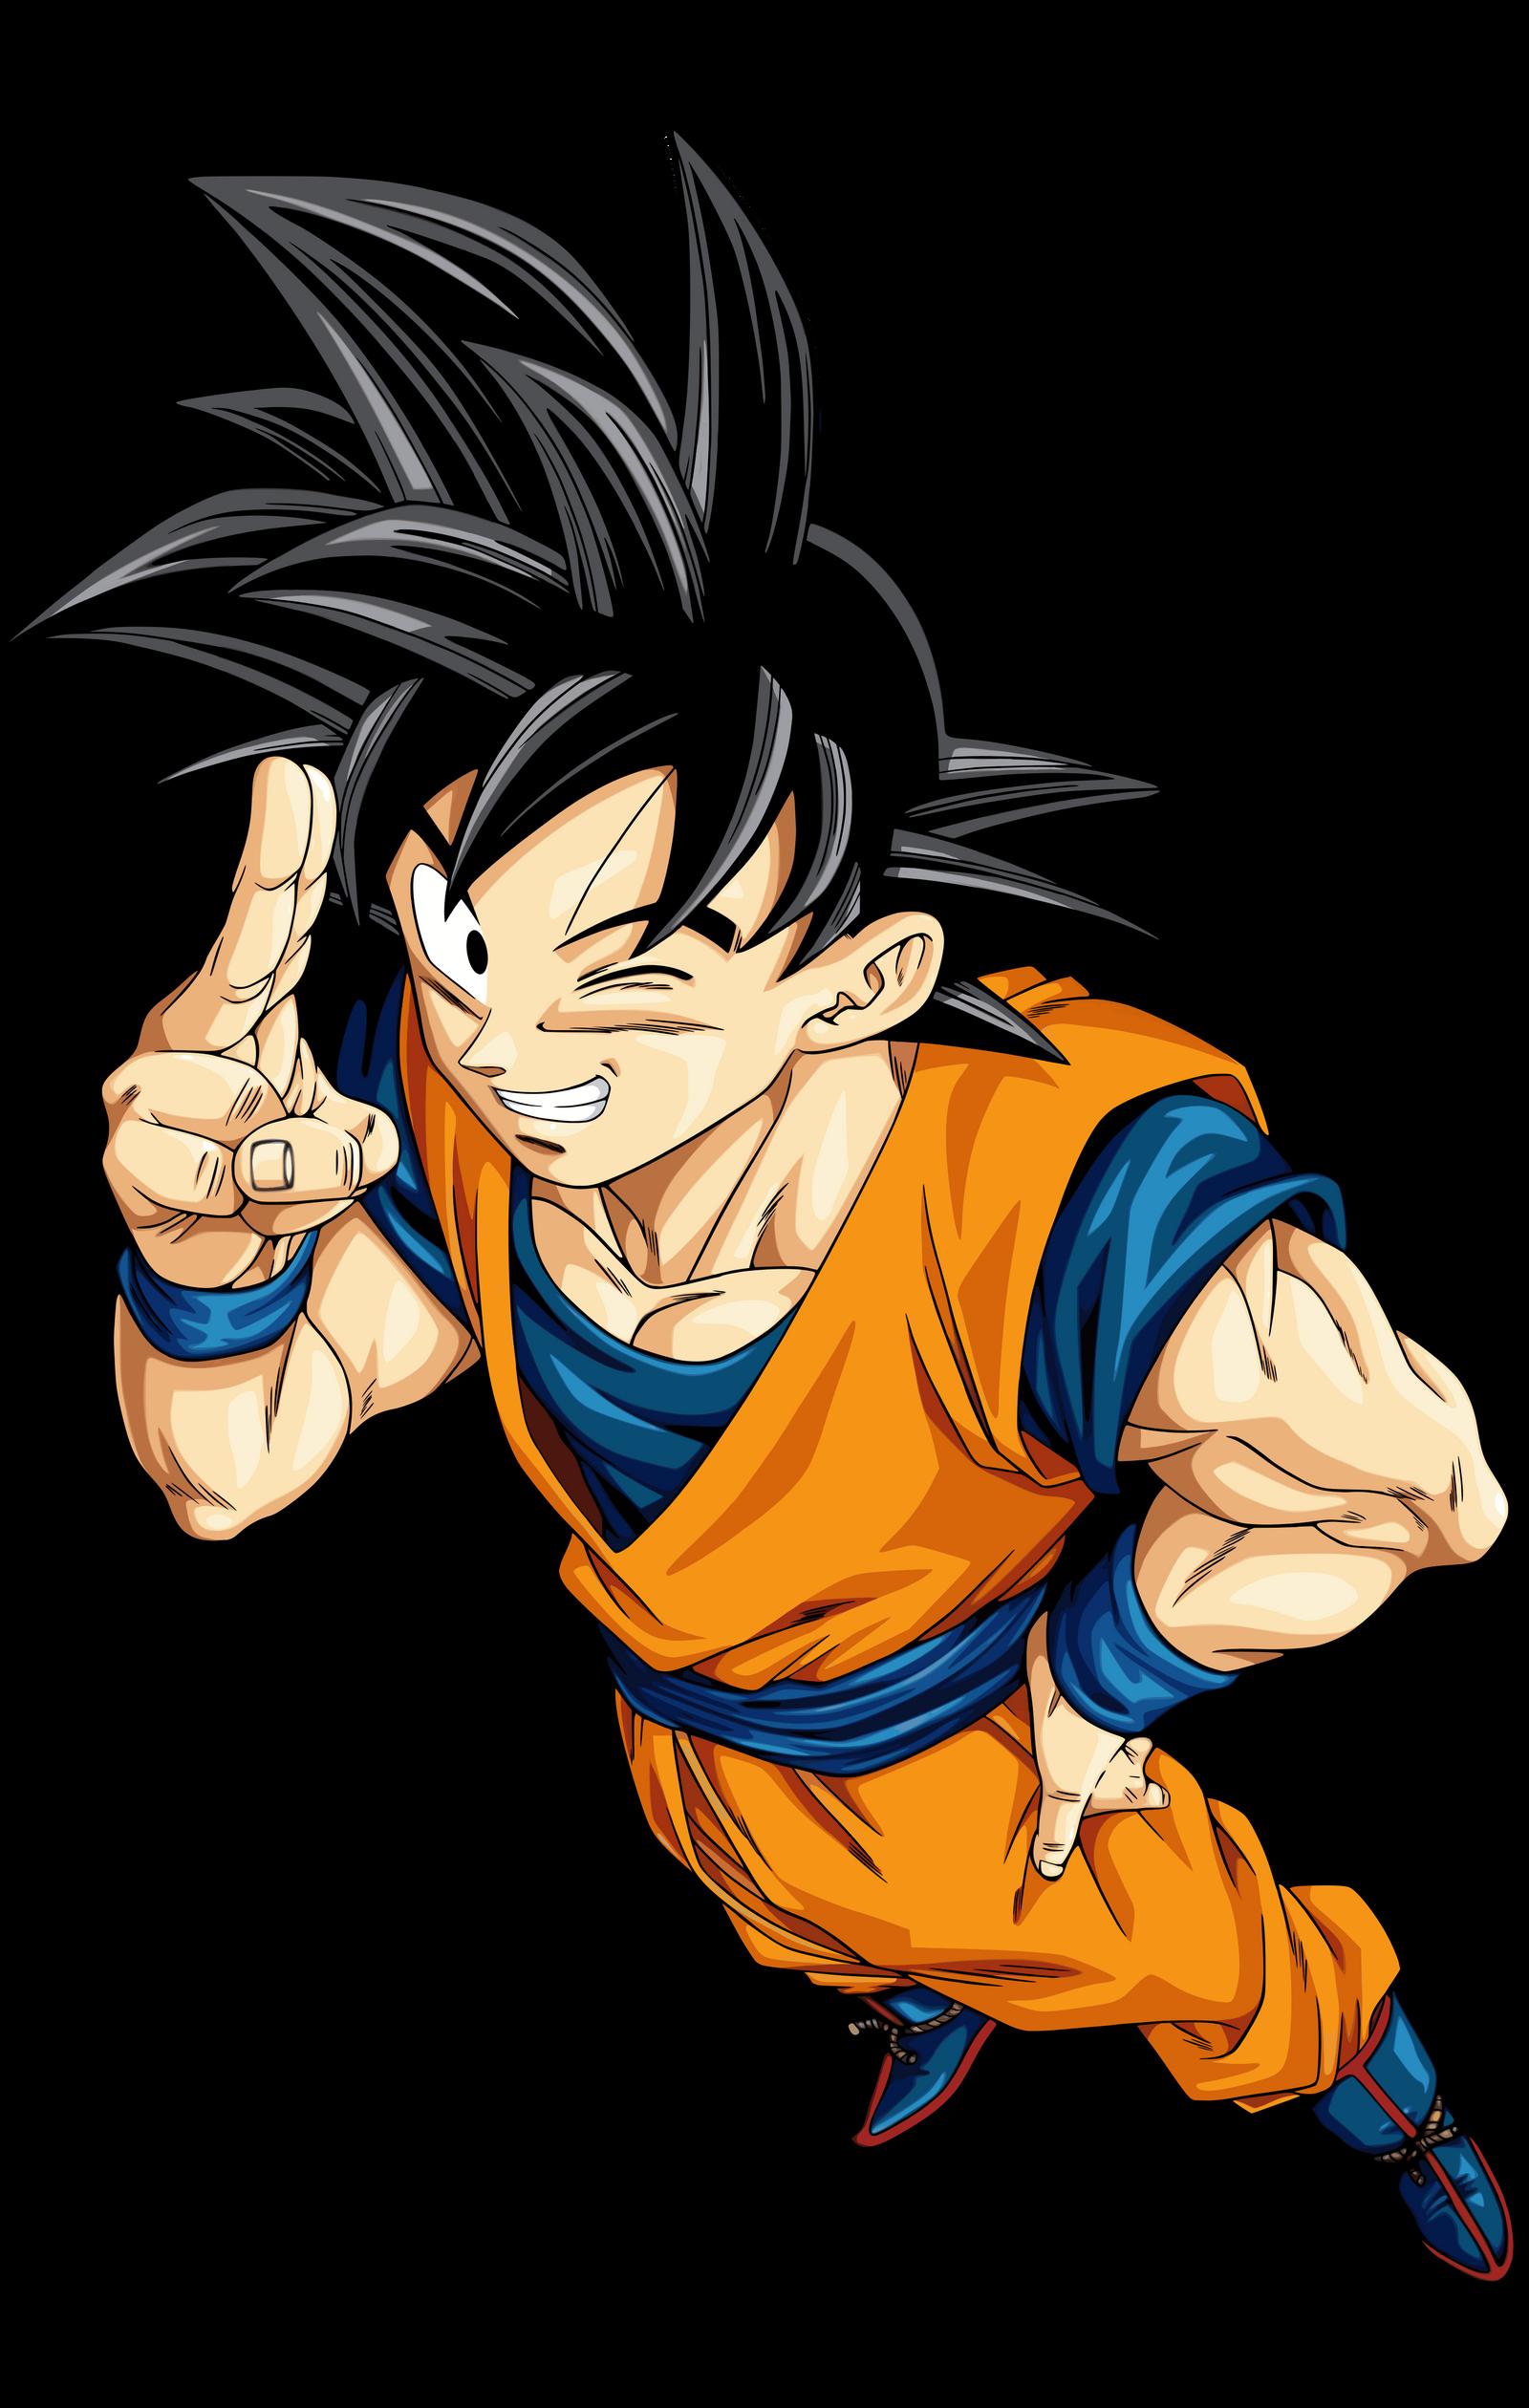 Custom Superhero Portrait Dragon Ball Personalized Illustration Cartoon Portrait Custom Drawing Family Portrait Comic Anime Arts In 2021 Dragon Ball Super Manga Anime Dragon Ball Super Dragon Ball Art